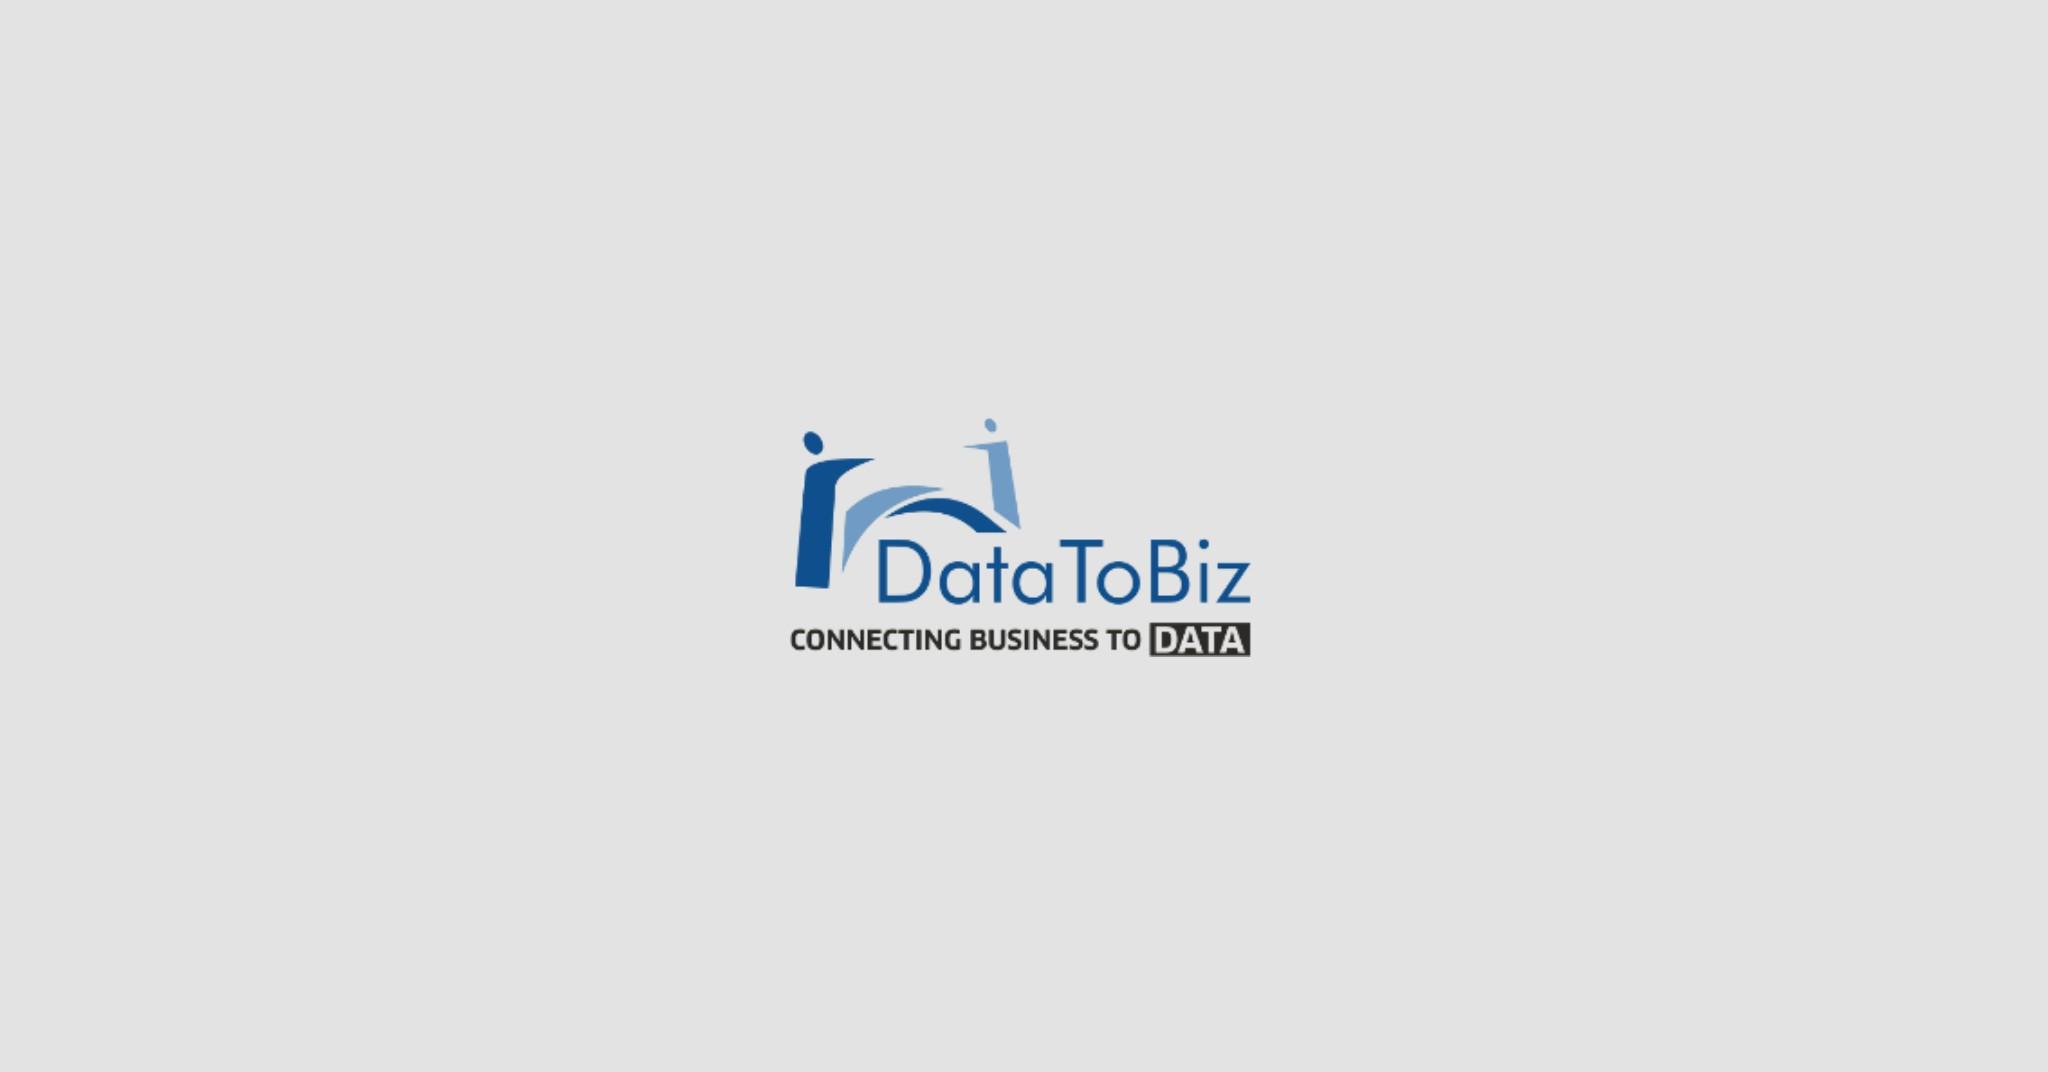 DataToBiz